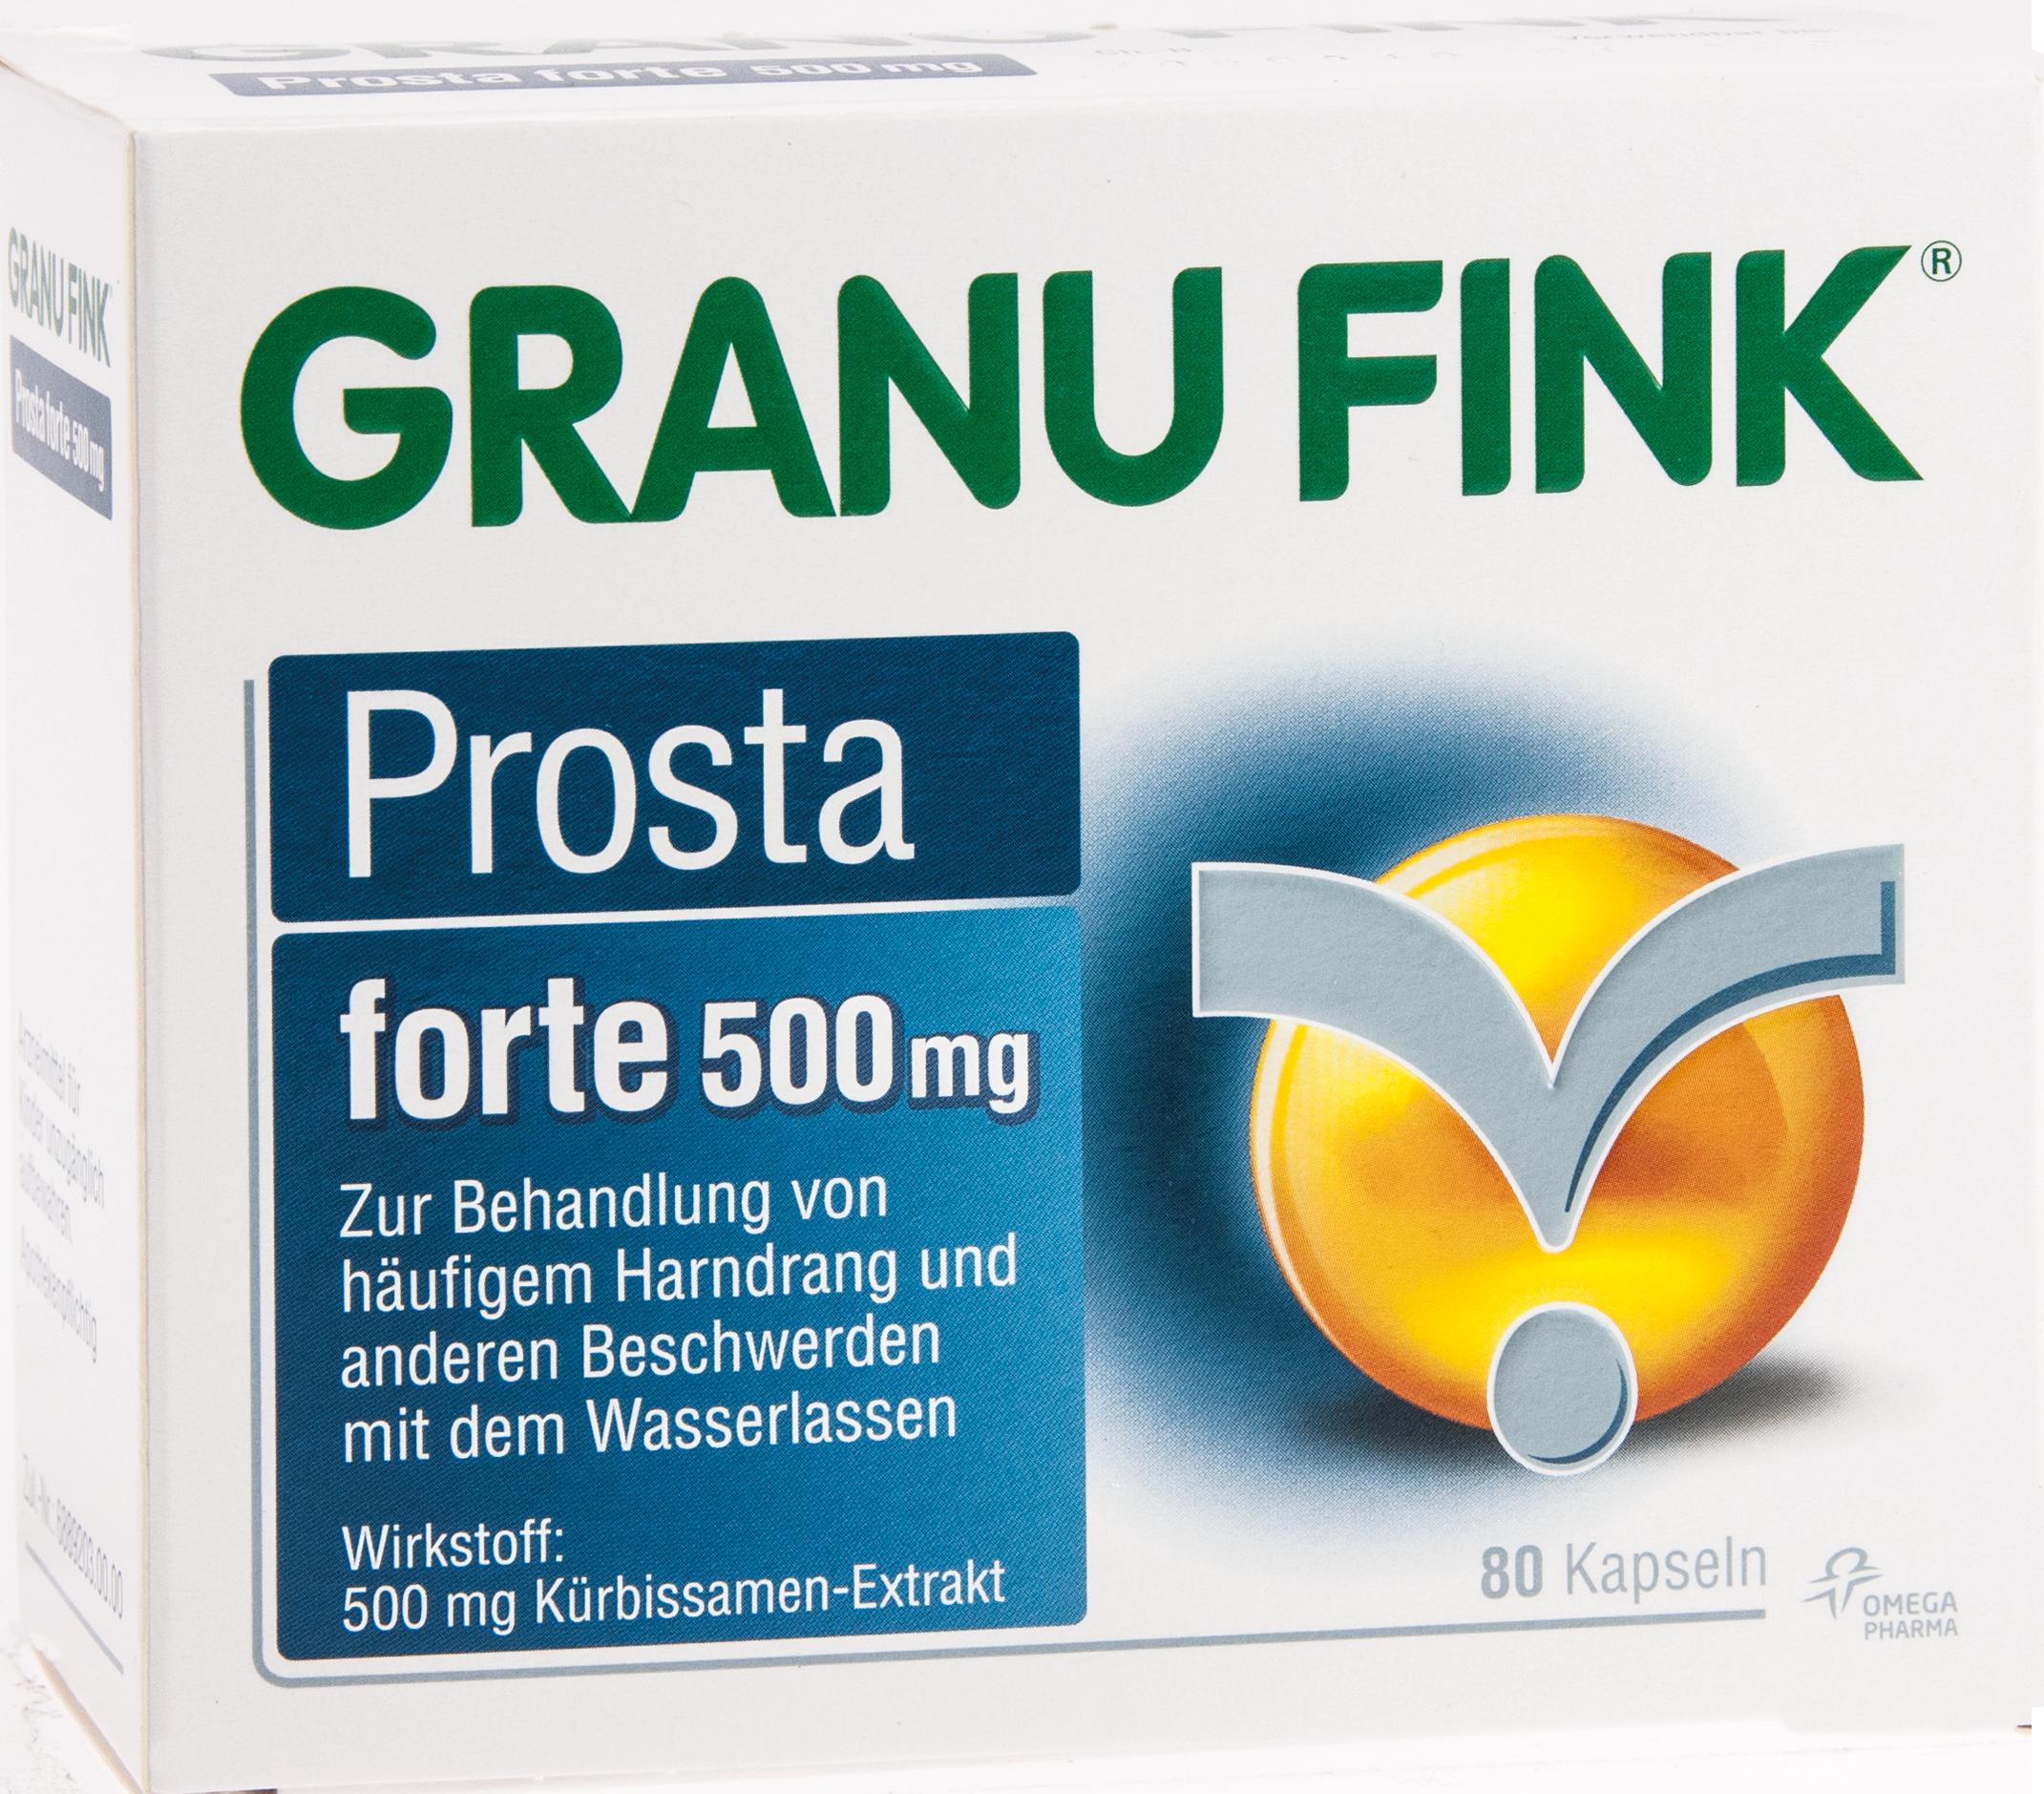 GRANU FINK Prosta forte 500 mg